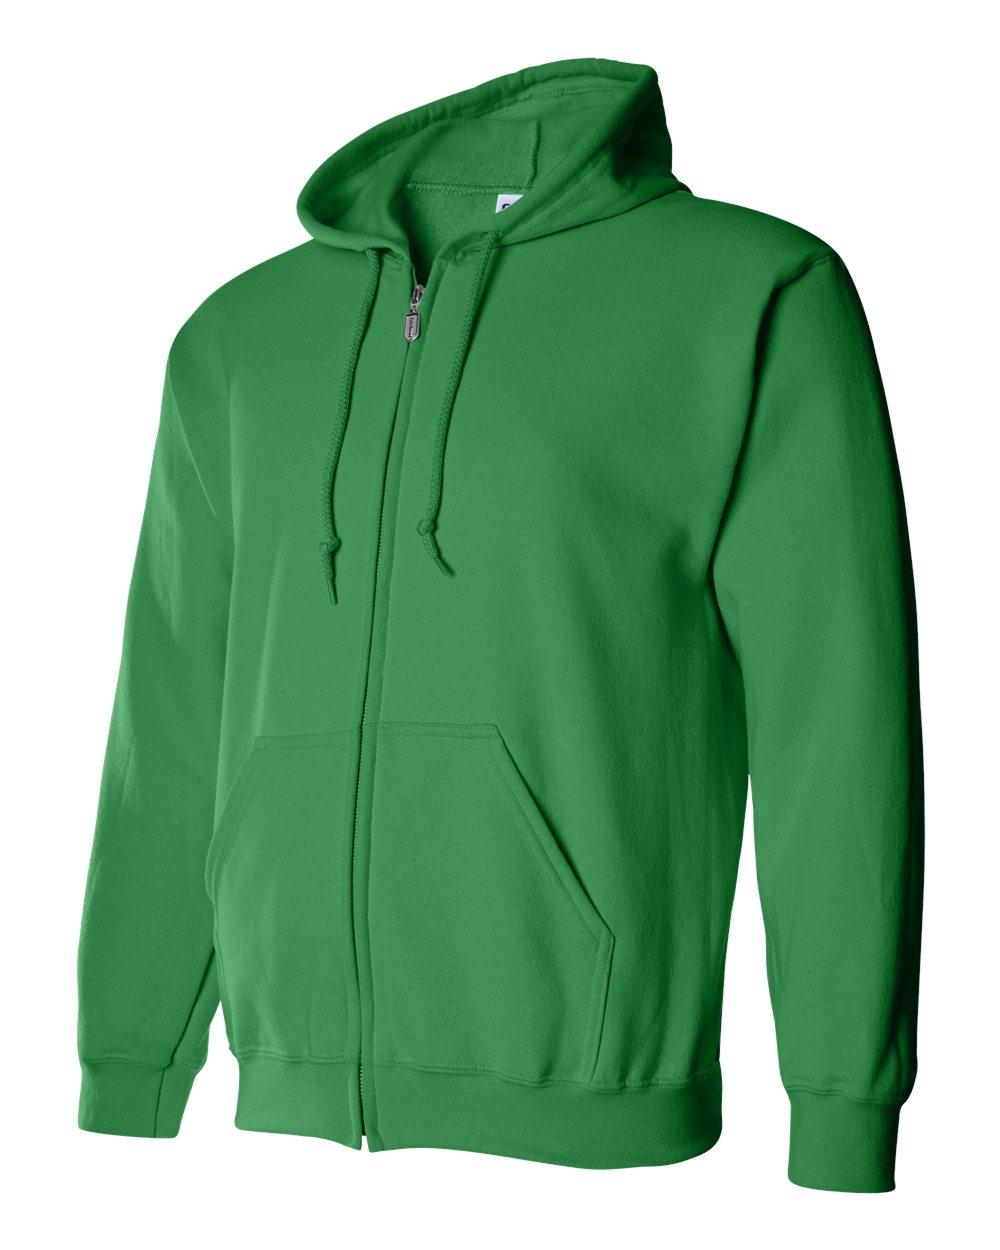 GIL18600 Irish Green